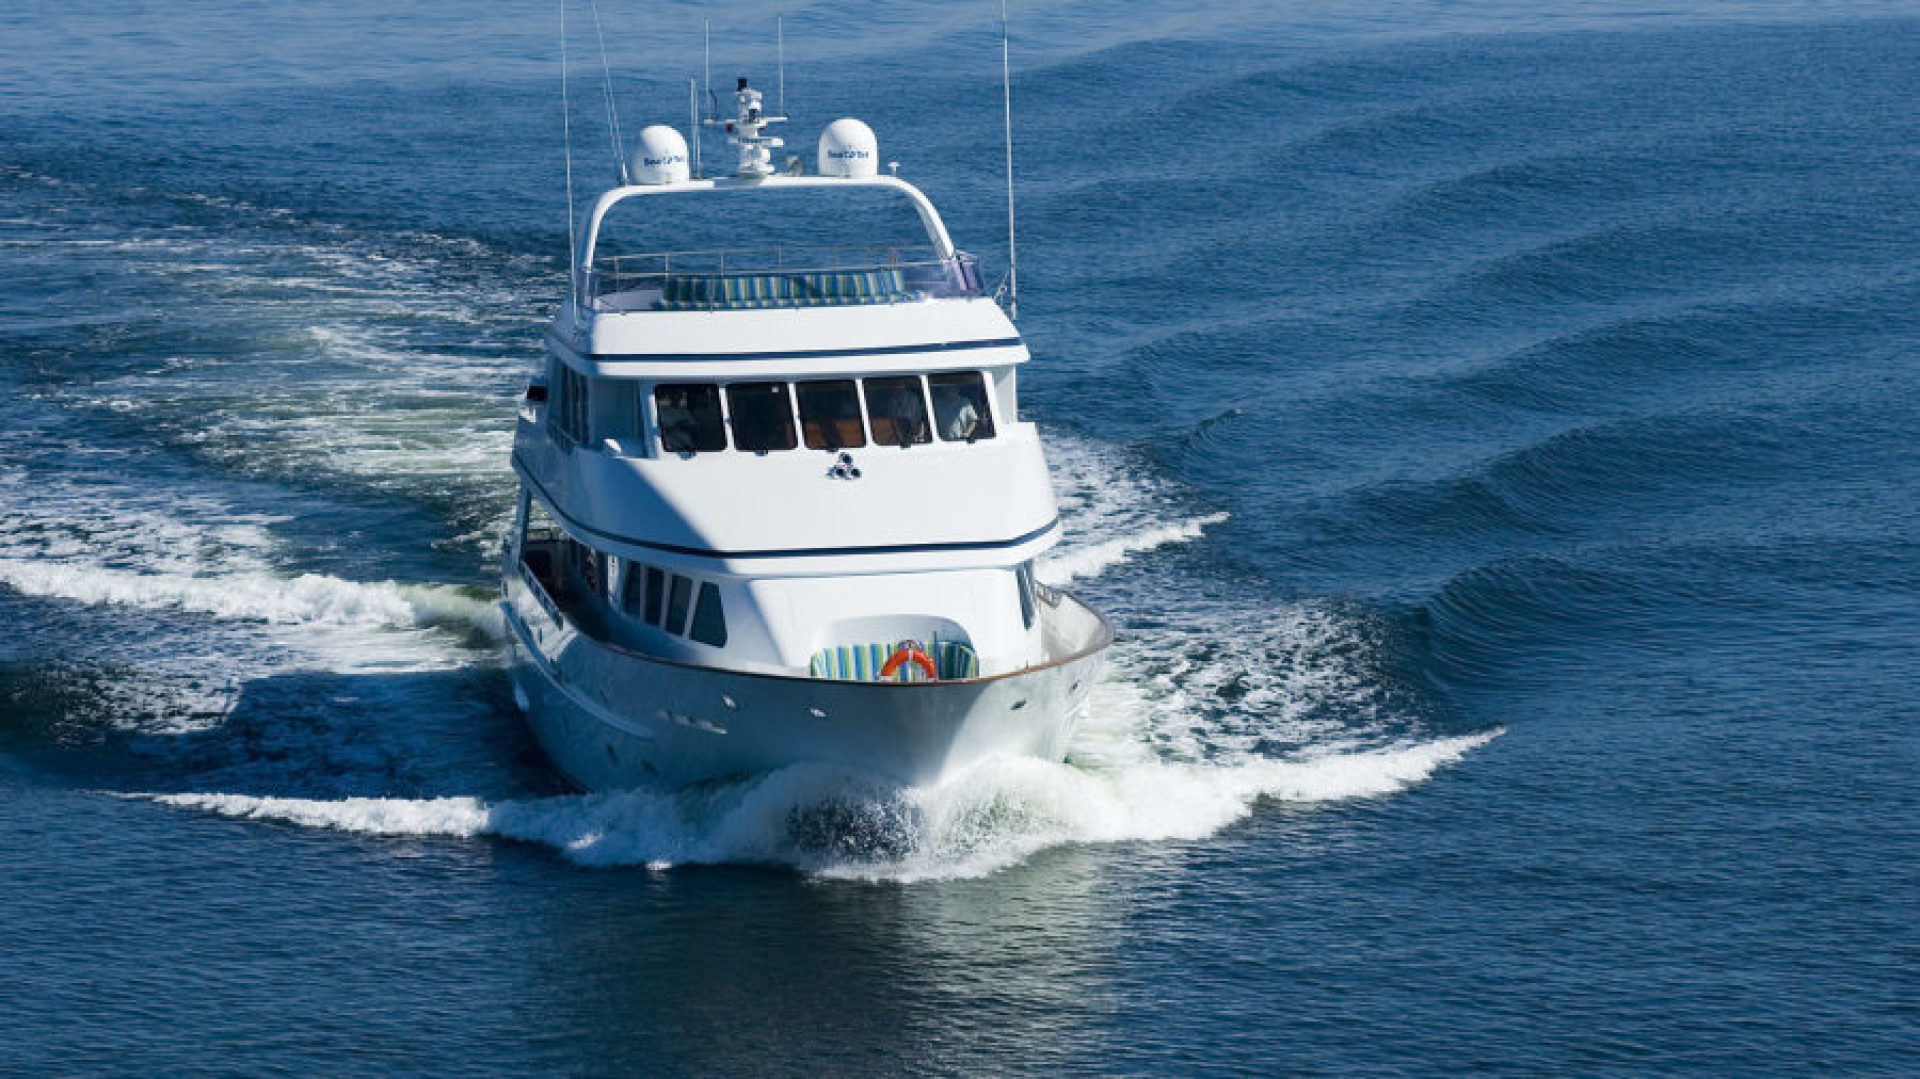 Conrad Shipyard-88 Motor Yacht 2005-Chillin Fort Lauderdale-Florida-United States-Conrad Motor Yacht 2005 Chillin-1537334 | Thumbnail